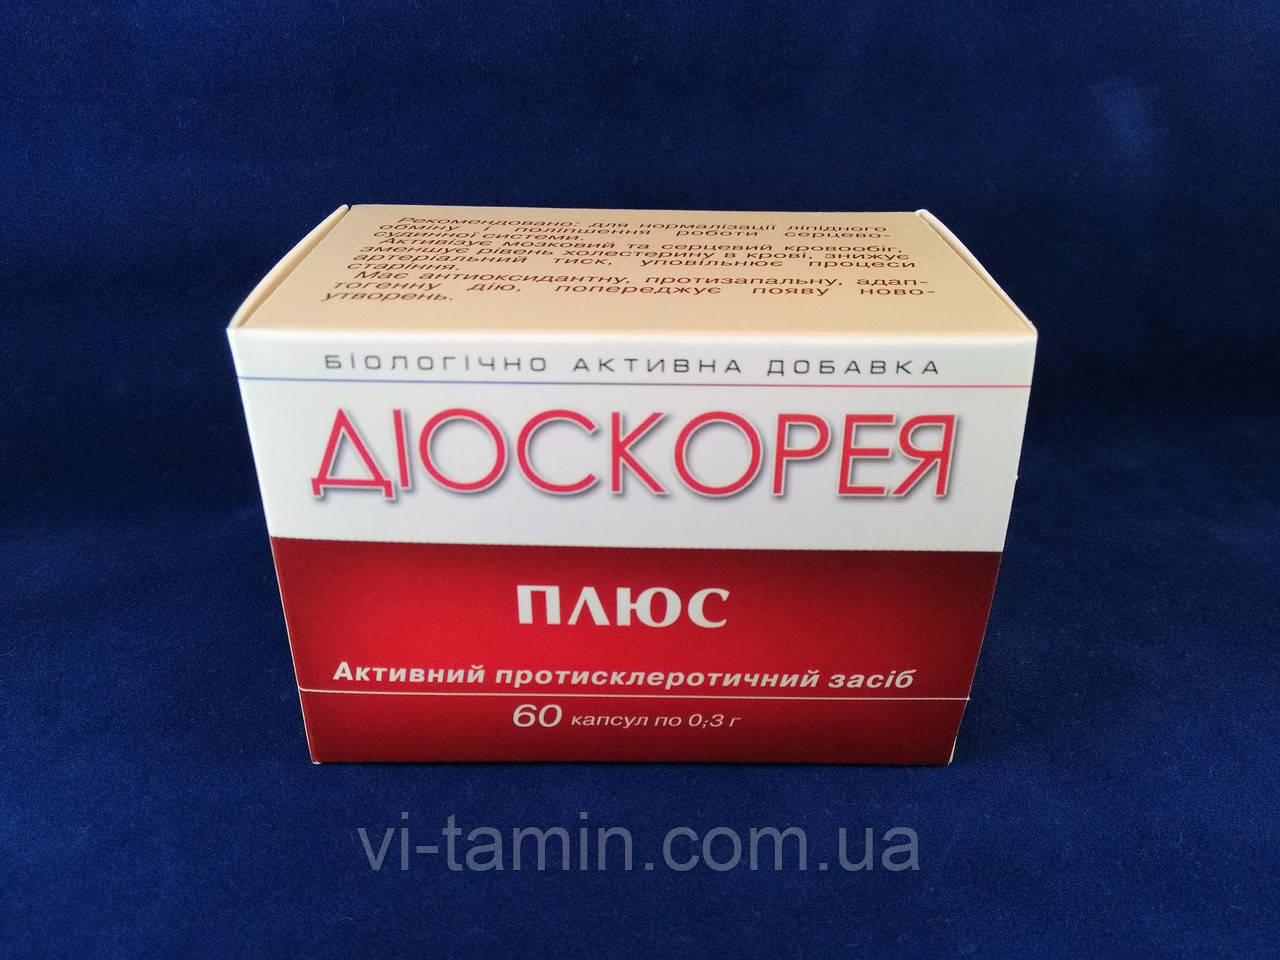 Диоскорея плюс, Янтра 2006, 60 капс.